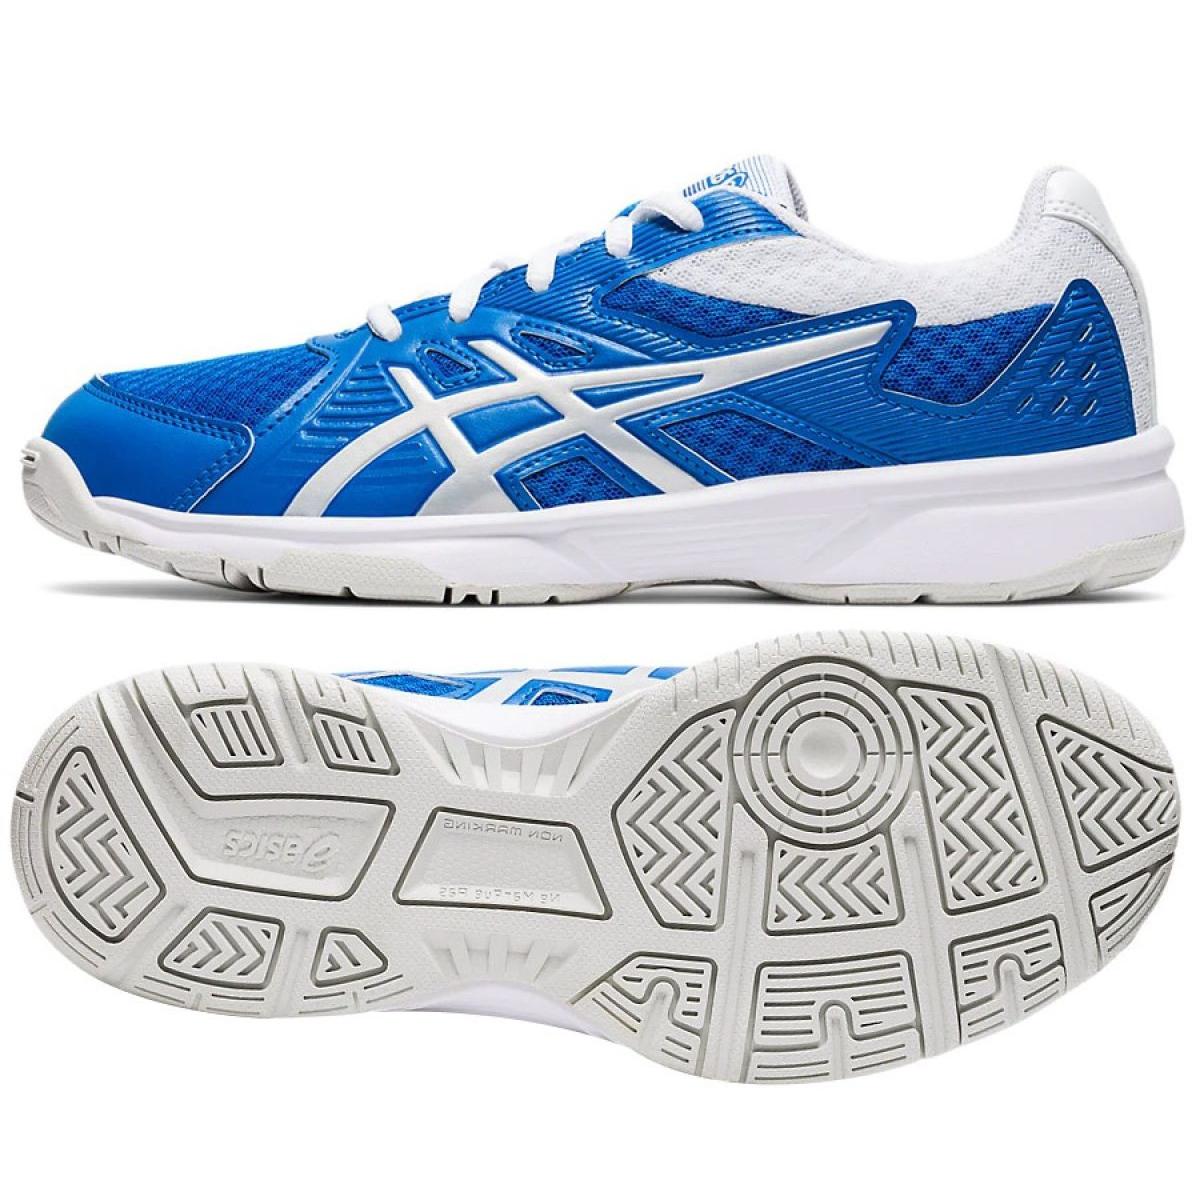 Asics Upcourt 3 W 1072A012-406 shoes